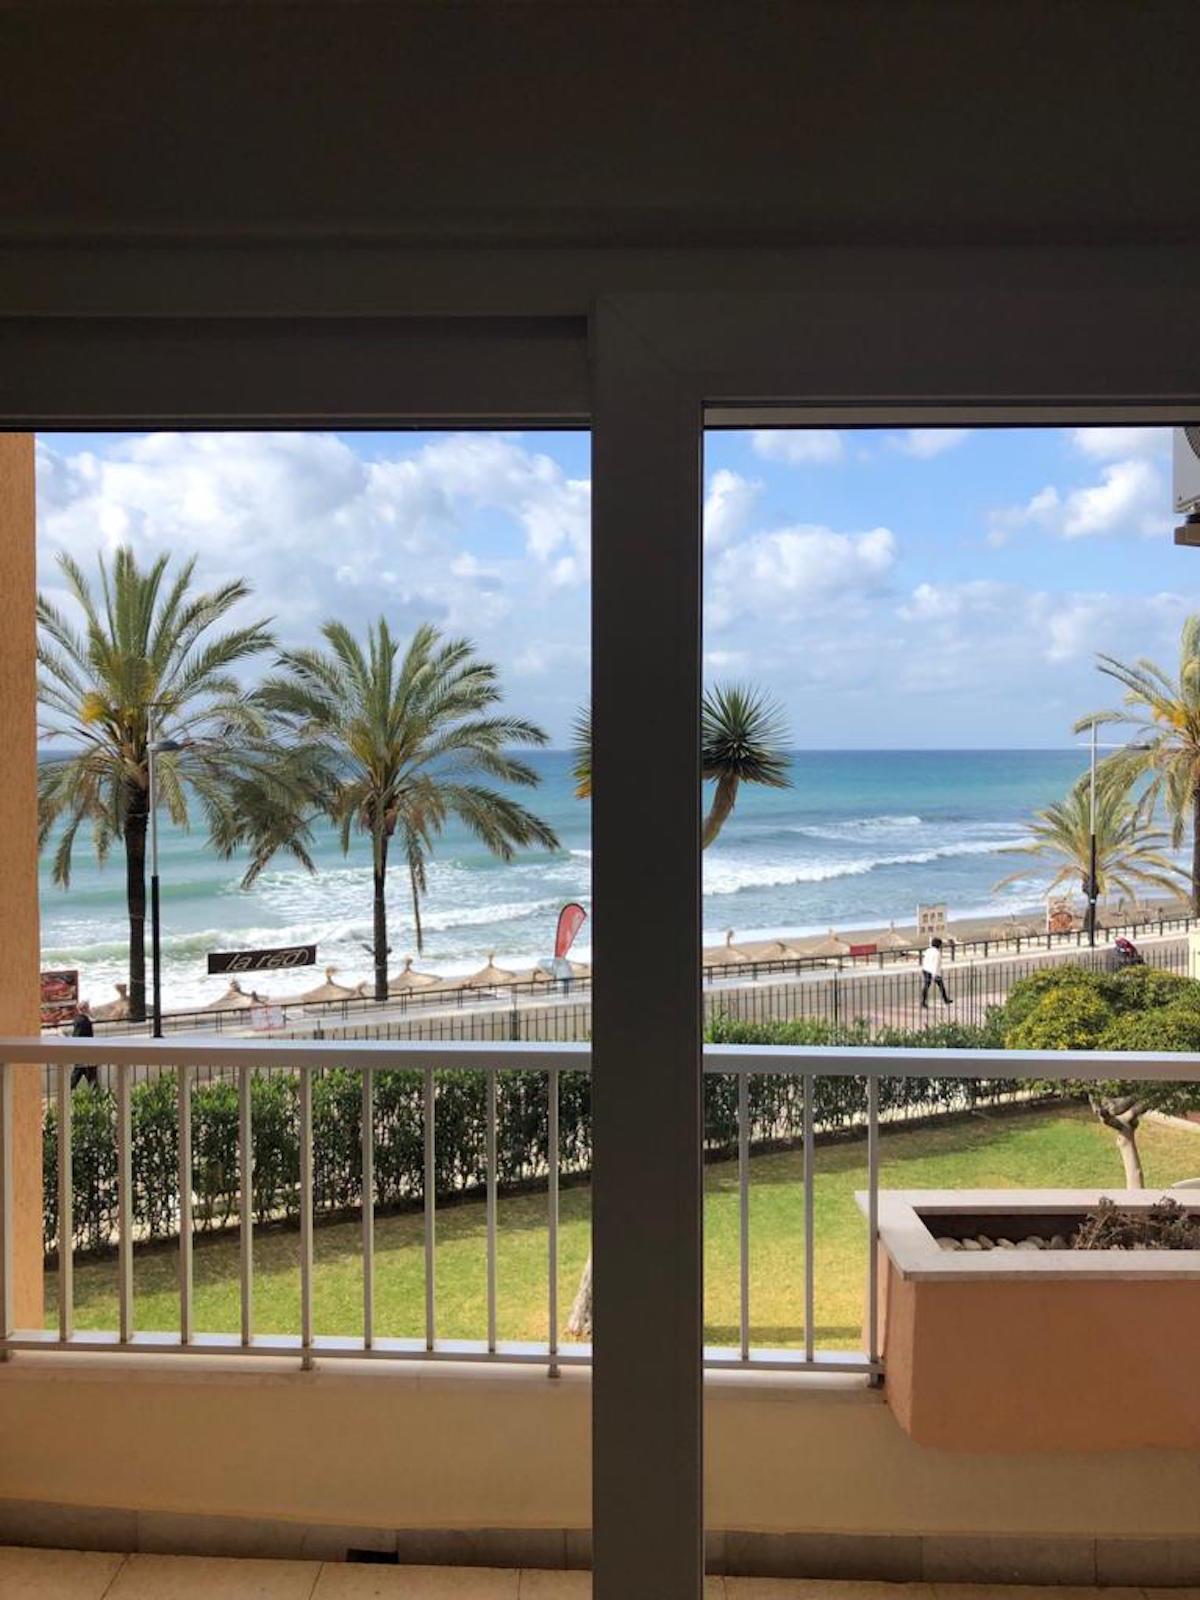 MARBELLA CENTER. FIRST LINE BEACH STUDIO !! Middle Floor Apartment, Marbella, Costa del Sol. Built 4,Spain